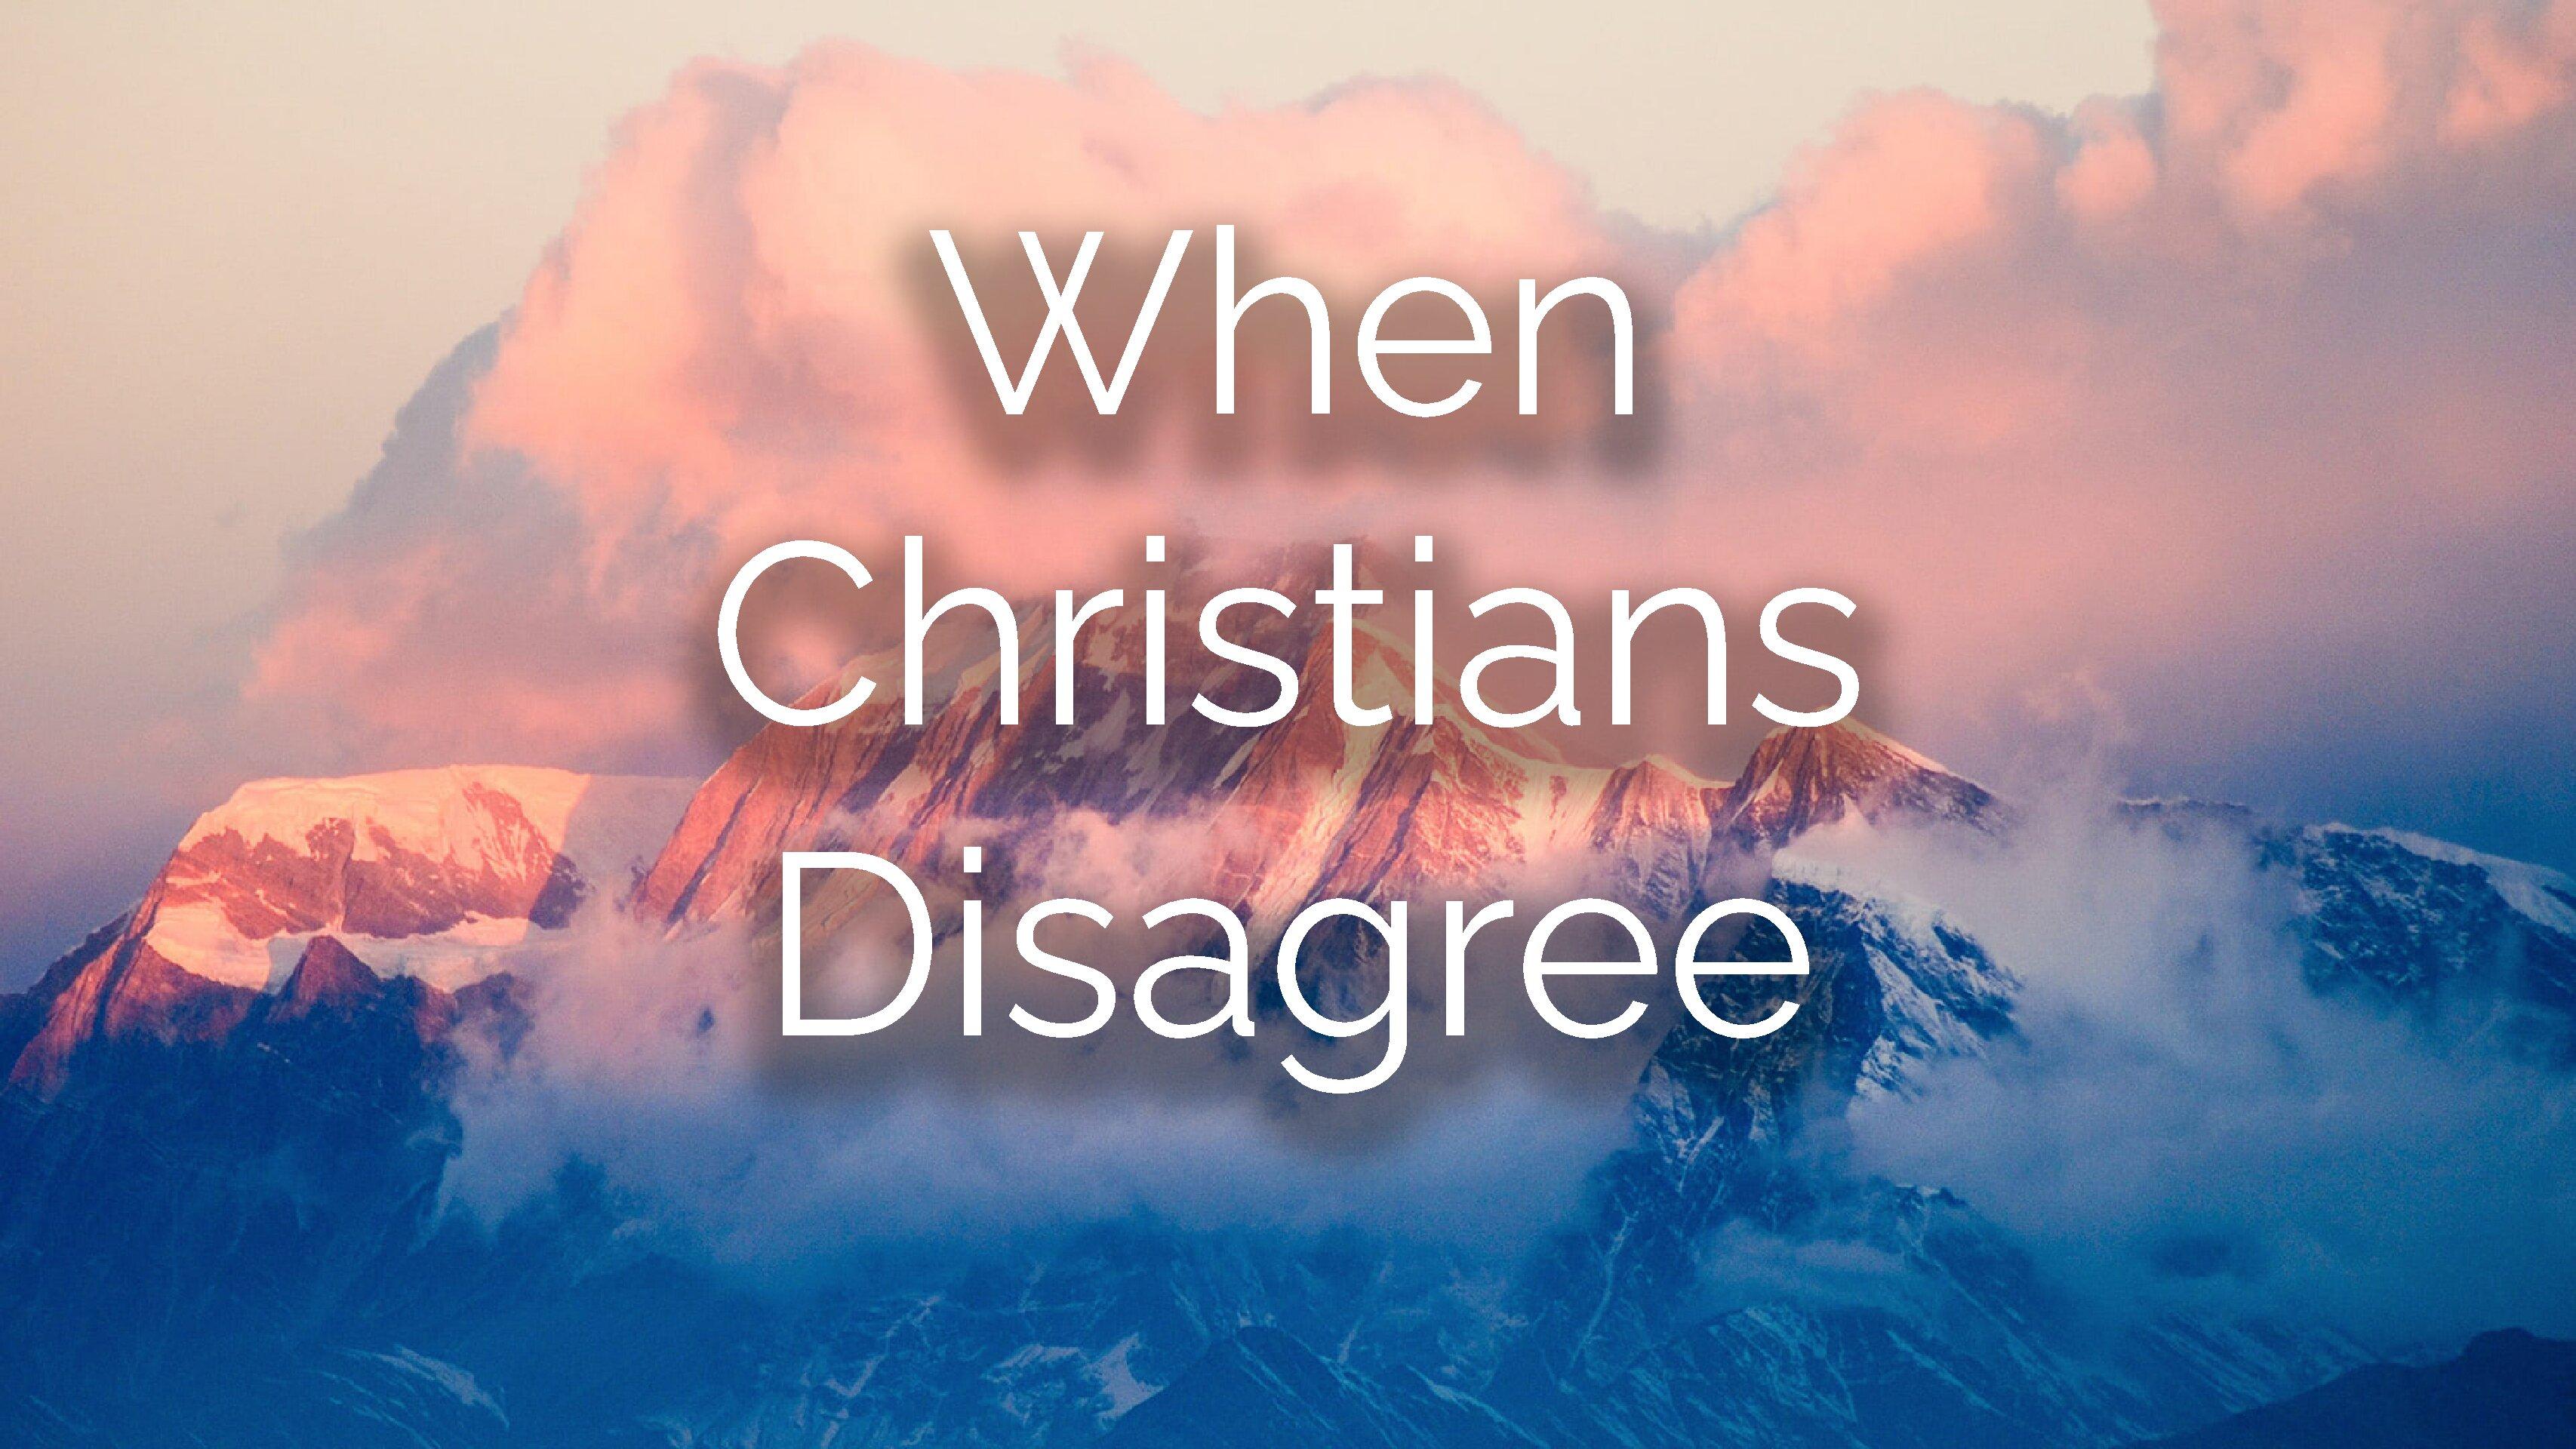 When Christians Disagree